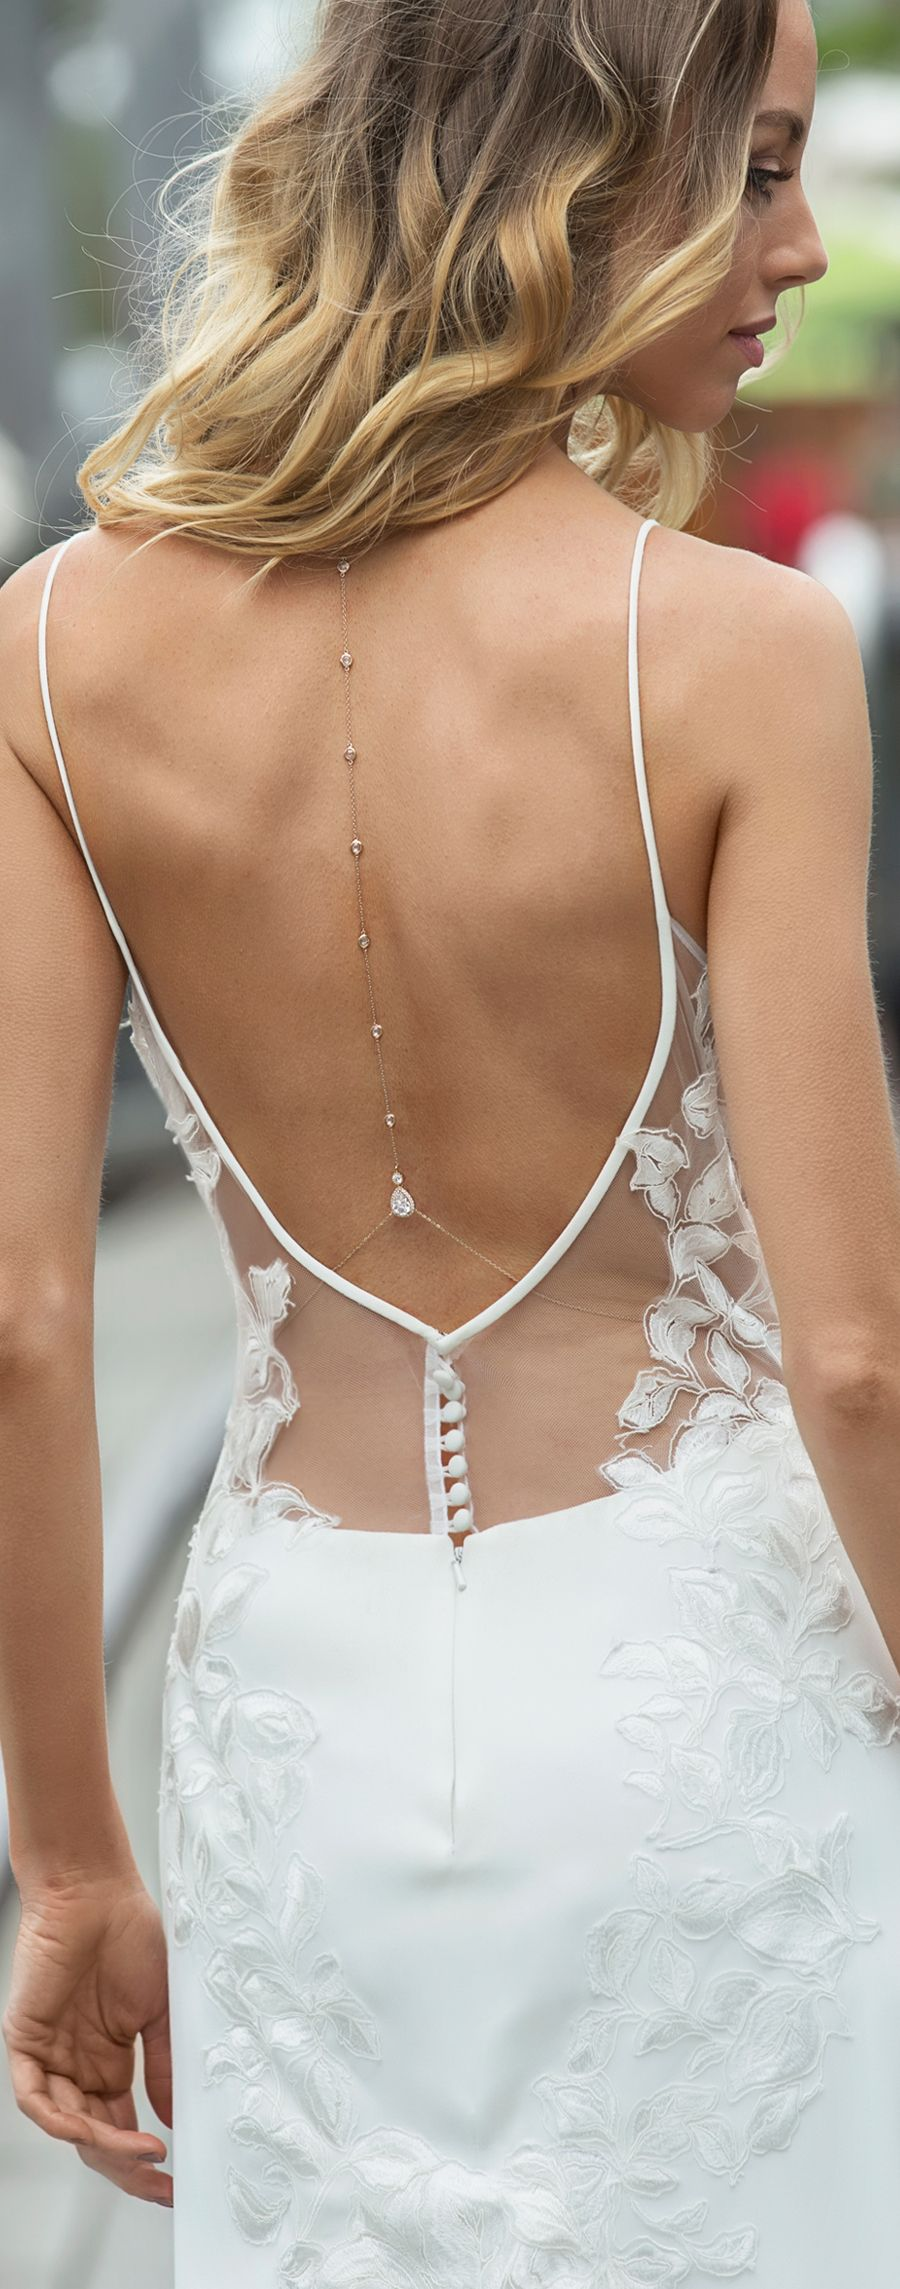 Enjoying the back necklace lingerie pinterest backless wedding